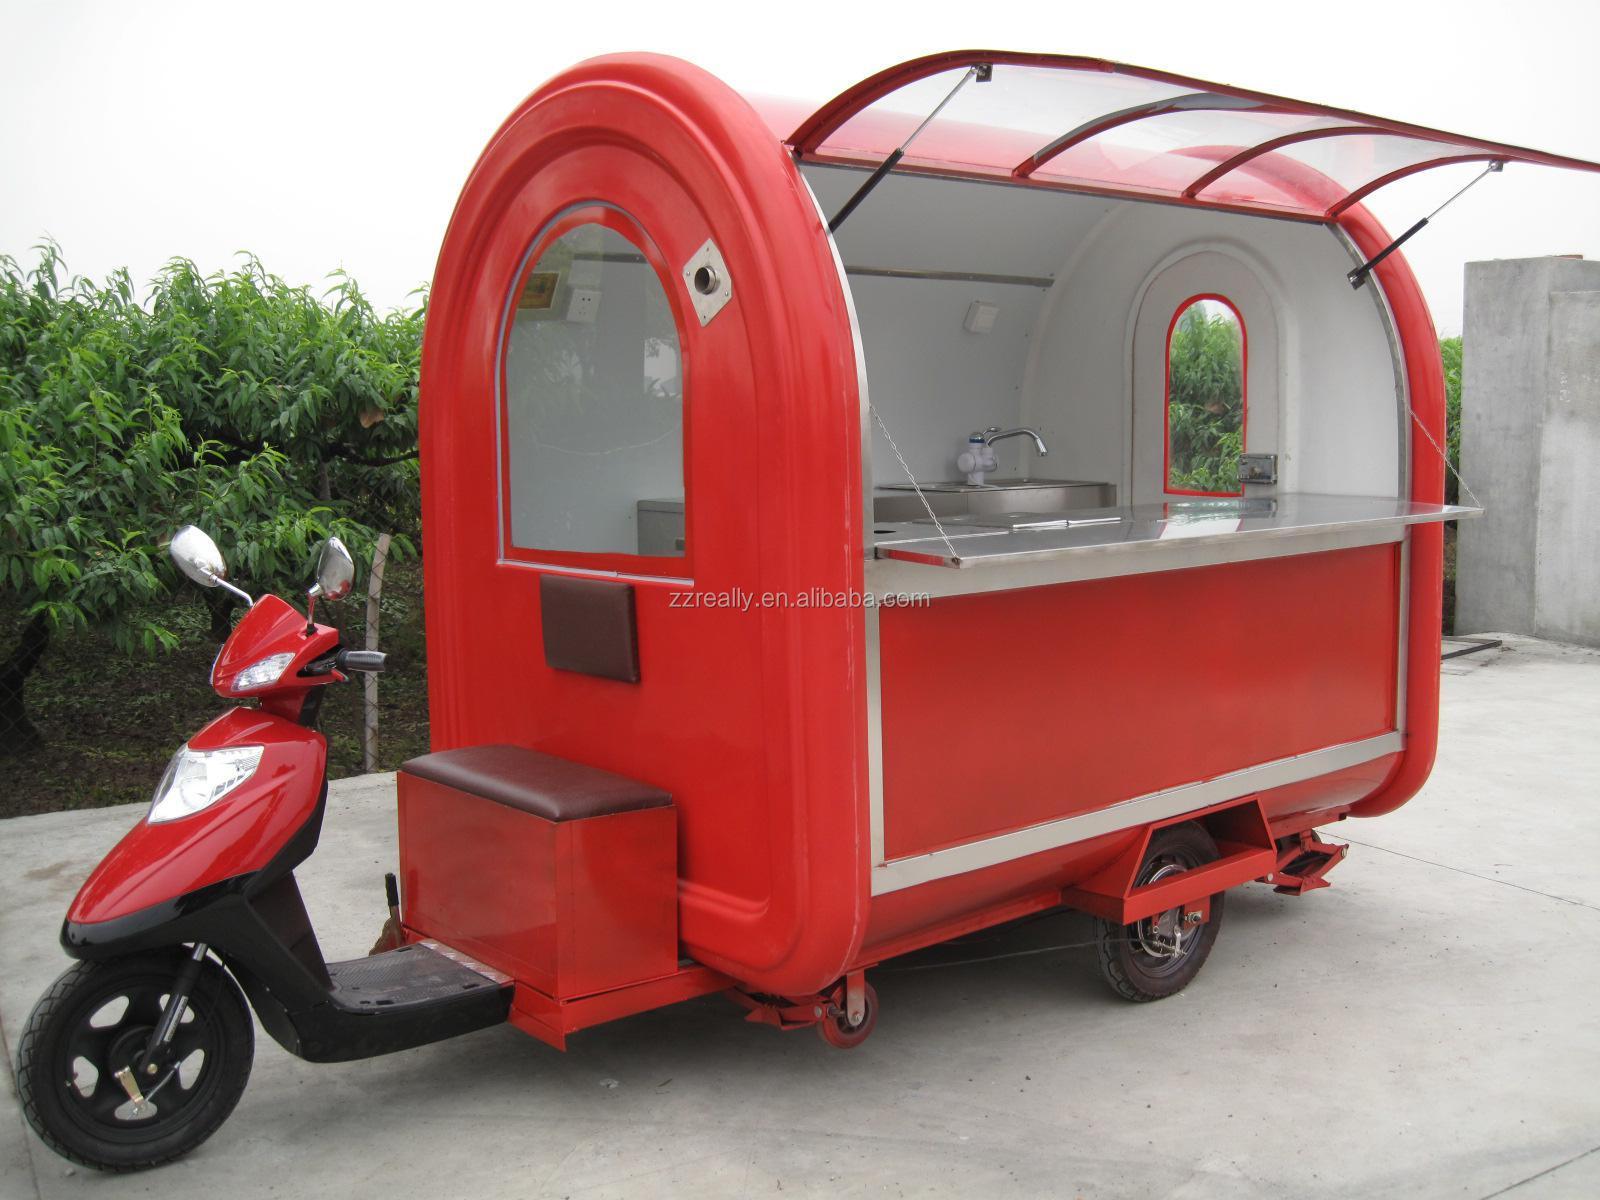 Popular China Mobile Food Kiosk Trolley Gasoline